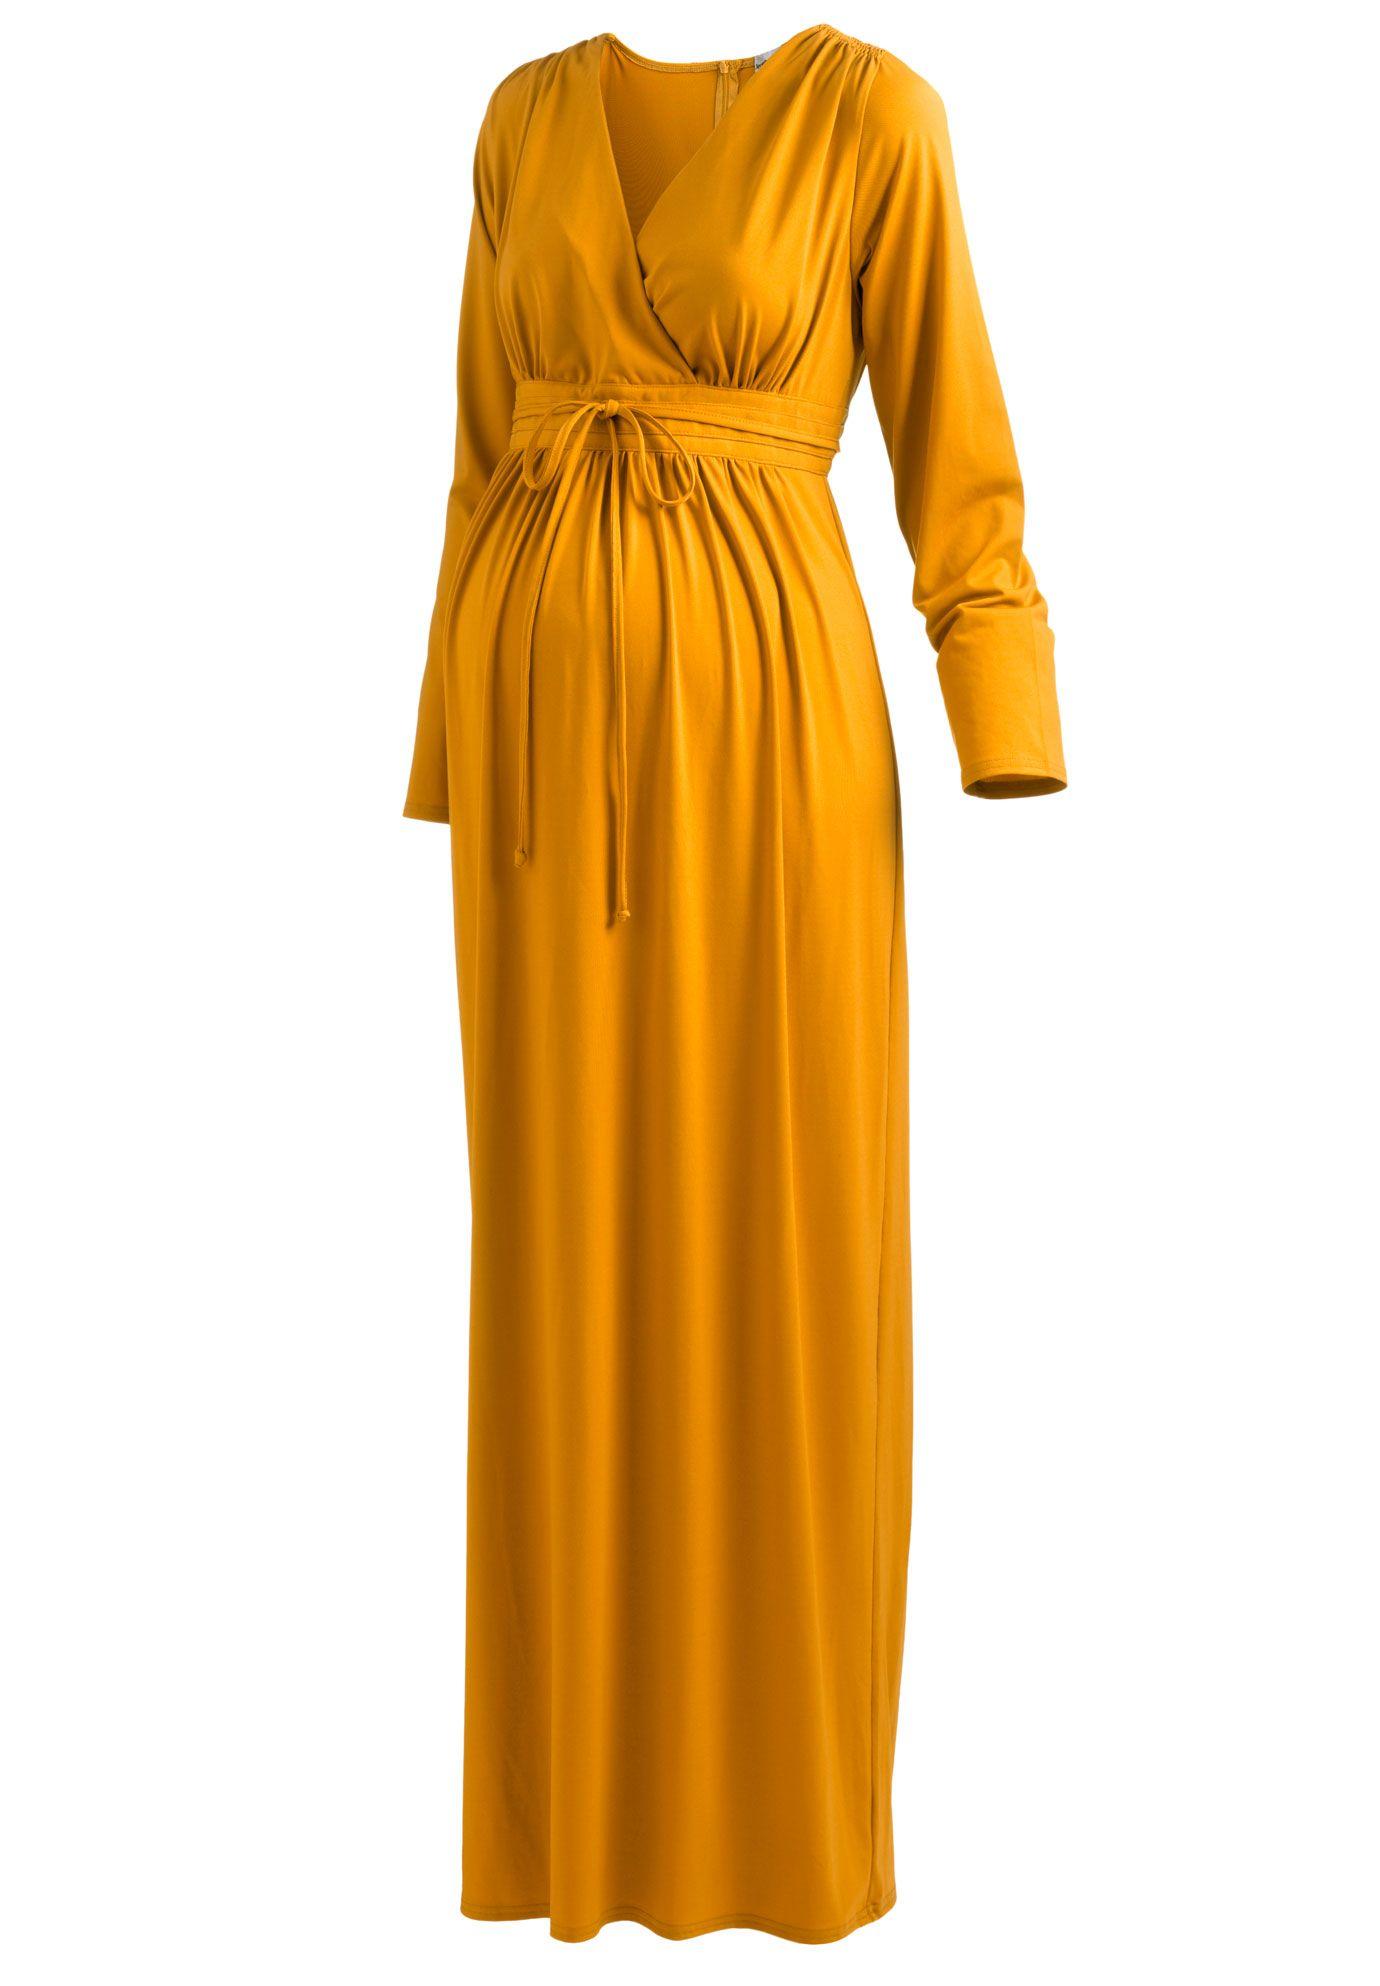 47b5e9e50b4a1 Maternity Knit Maxi Dress Honey Mustard,12 Plus Size in Winter 2012 from  Jessica London